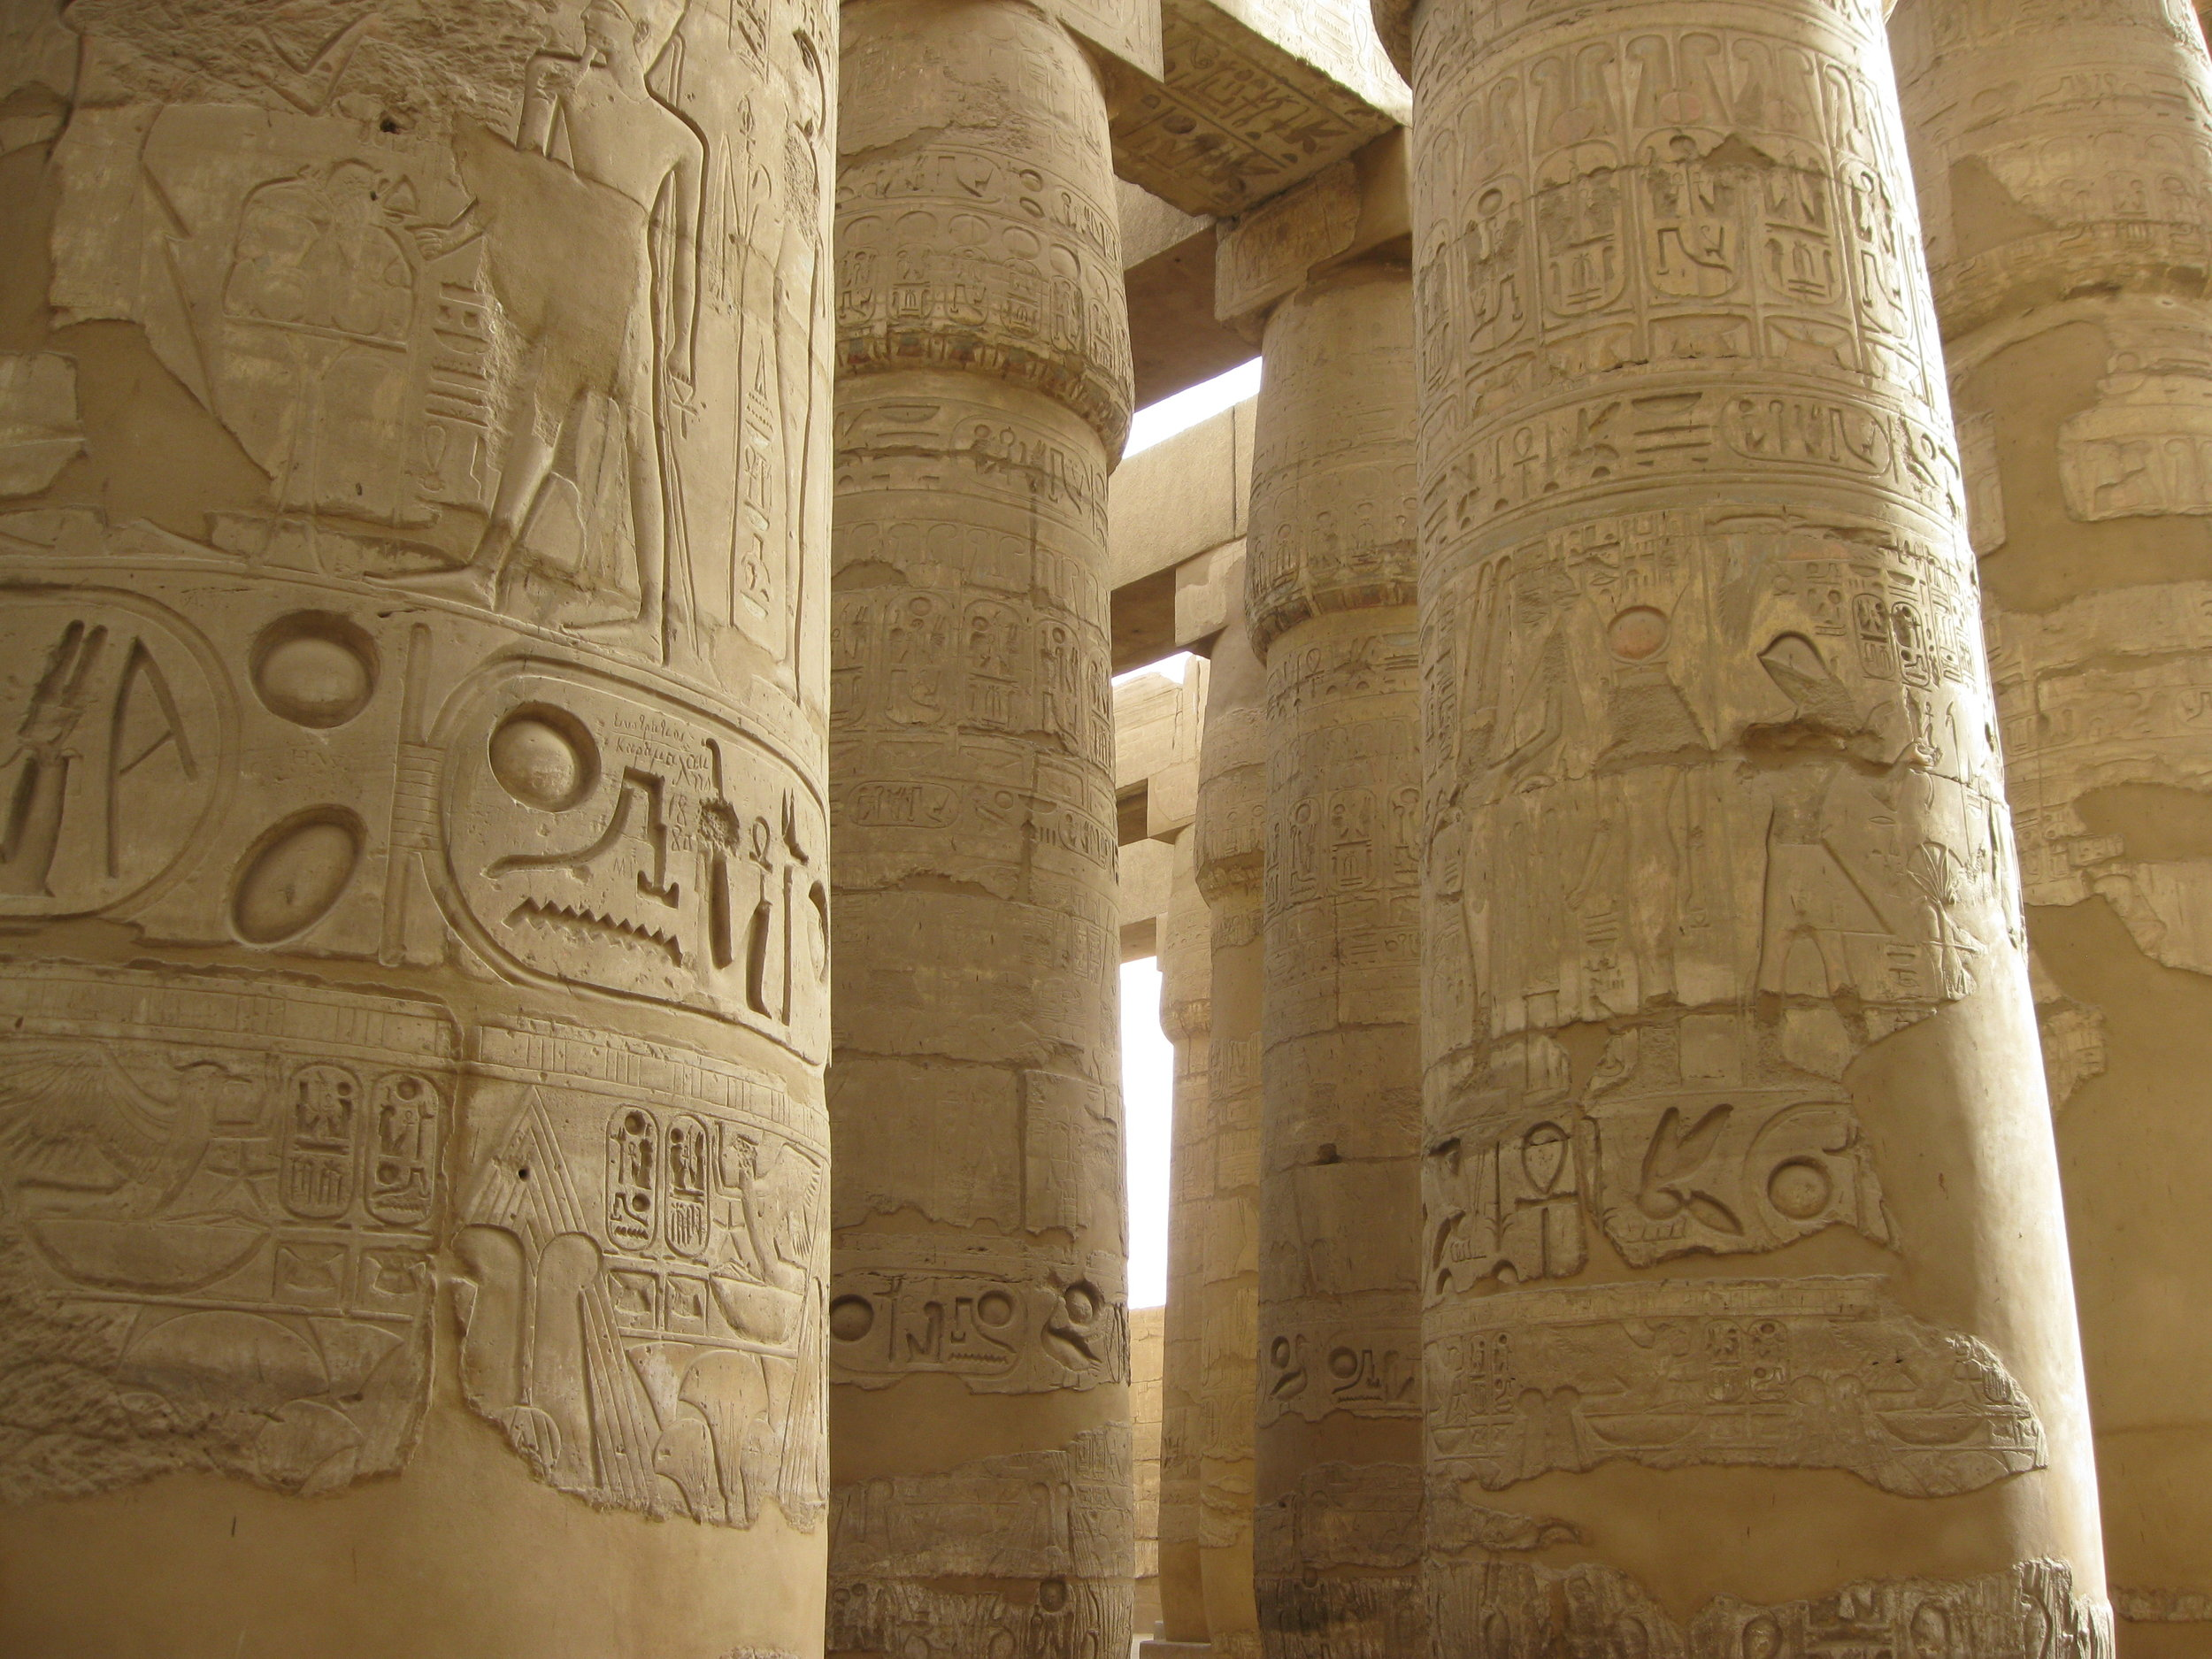 Nubia Tours - Cairo, EgyptRequests: nubia@navigo360.comnubiatours.org+202 762 5960Eastern +7 hours Standard / +6 hours DSTPacific +10 hours Standard / +9 hours DST